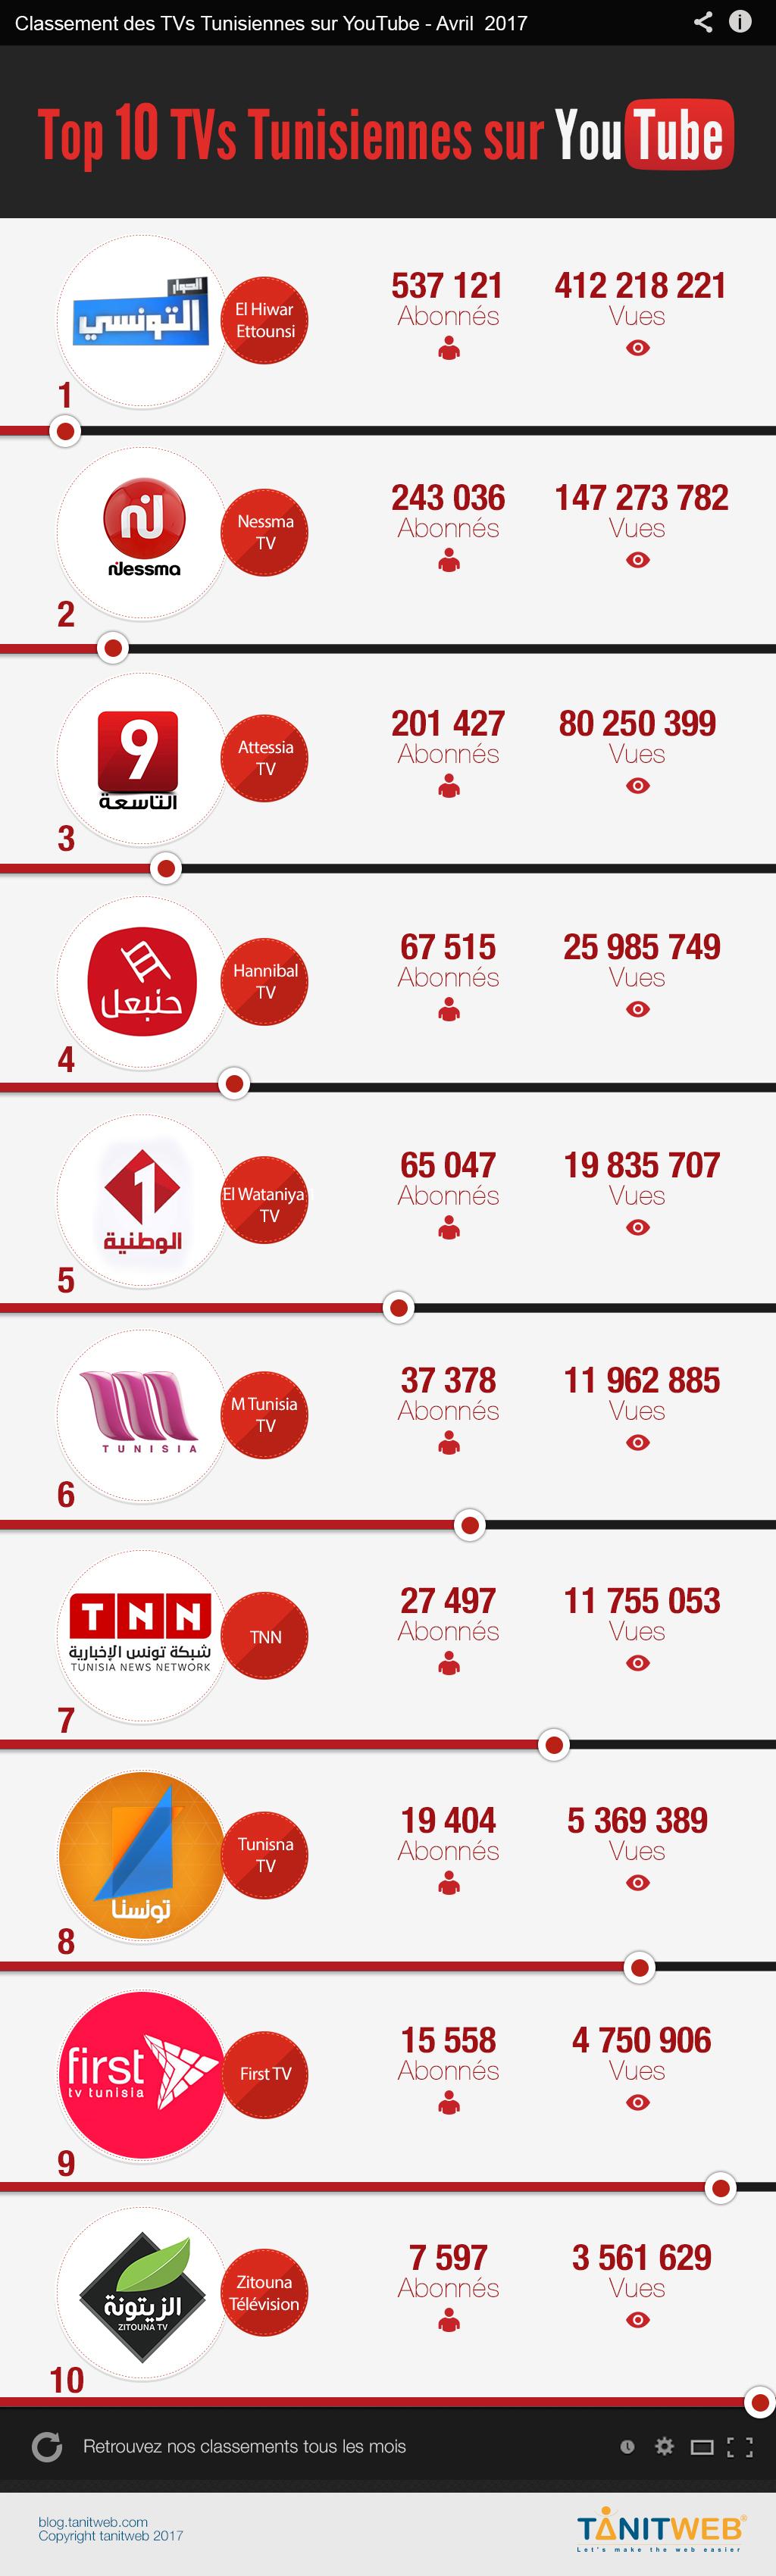 Avril 2017 : TOP 10 des TVs Tunisiennes sur YouTube